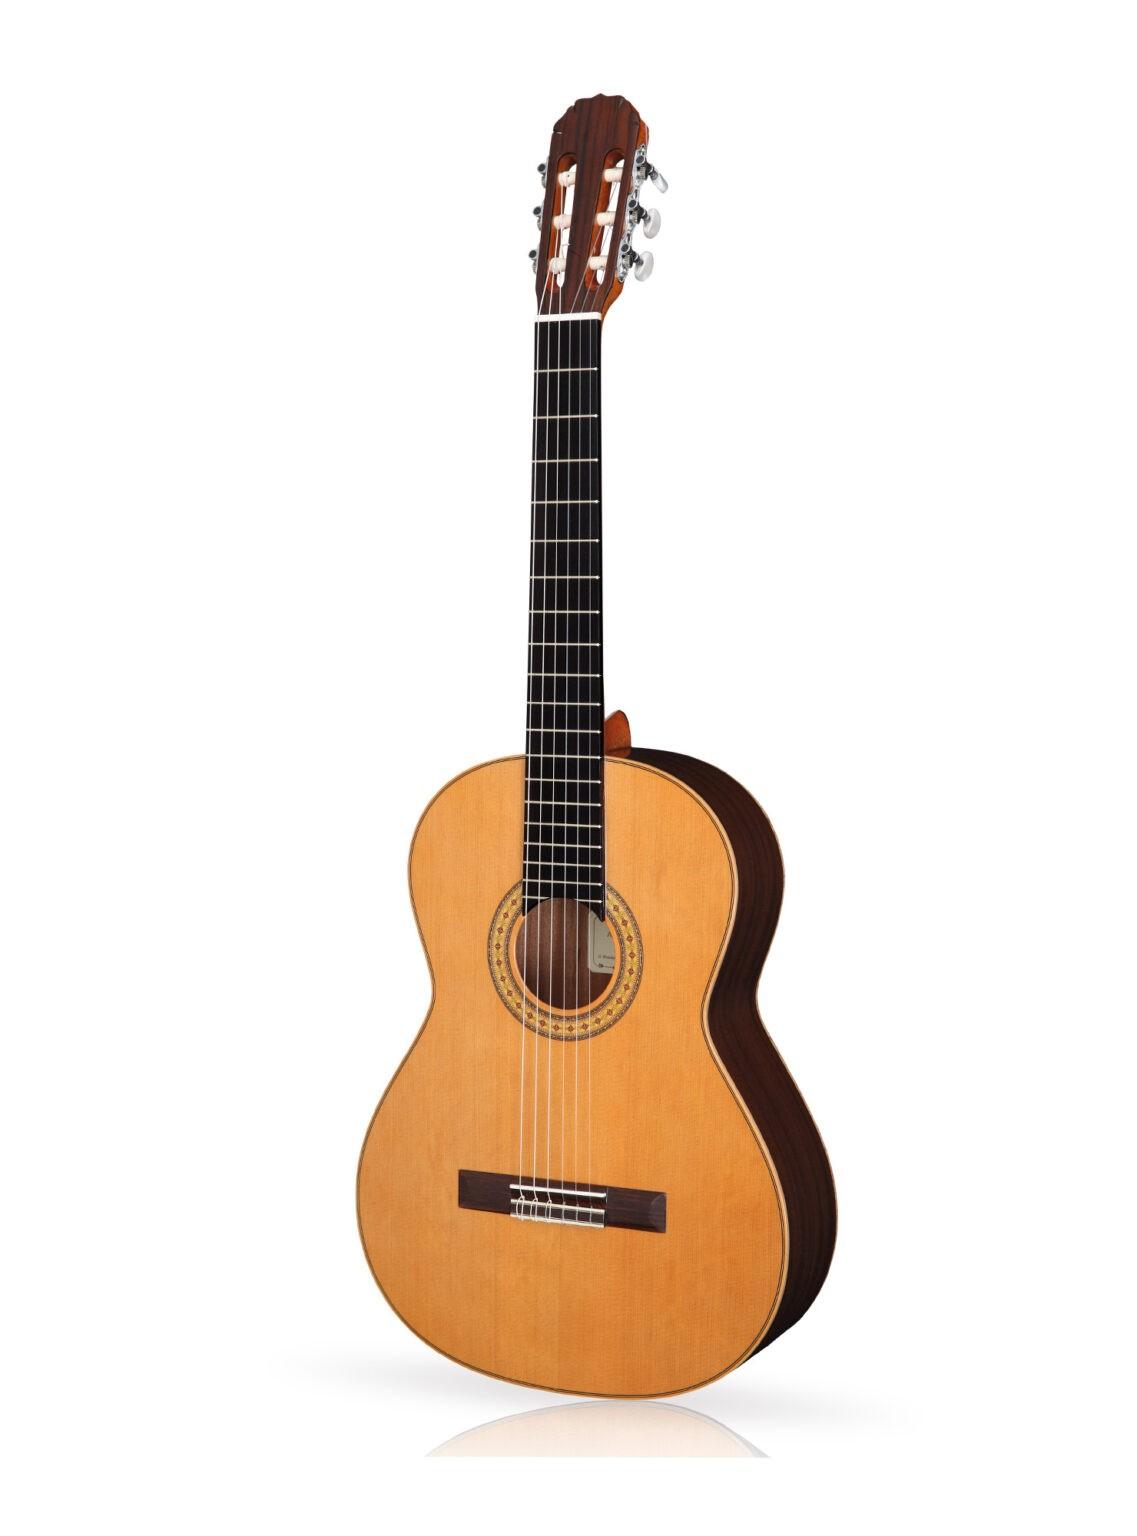 Guitarras de Angel Benito Aguado - Guitarras de estudio - Estudio Sapeli